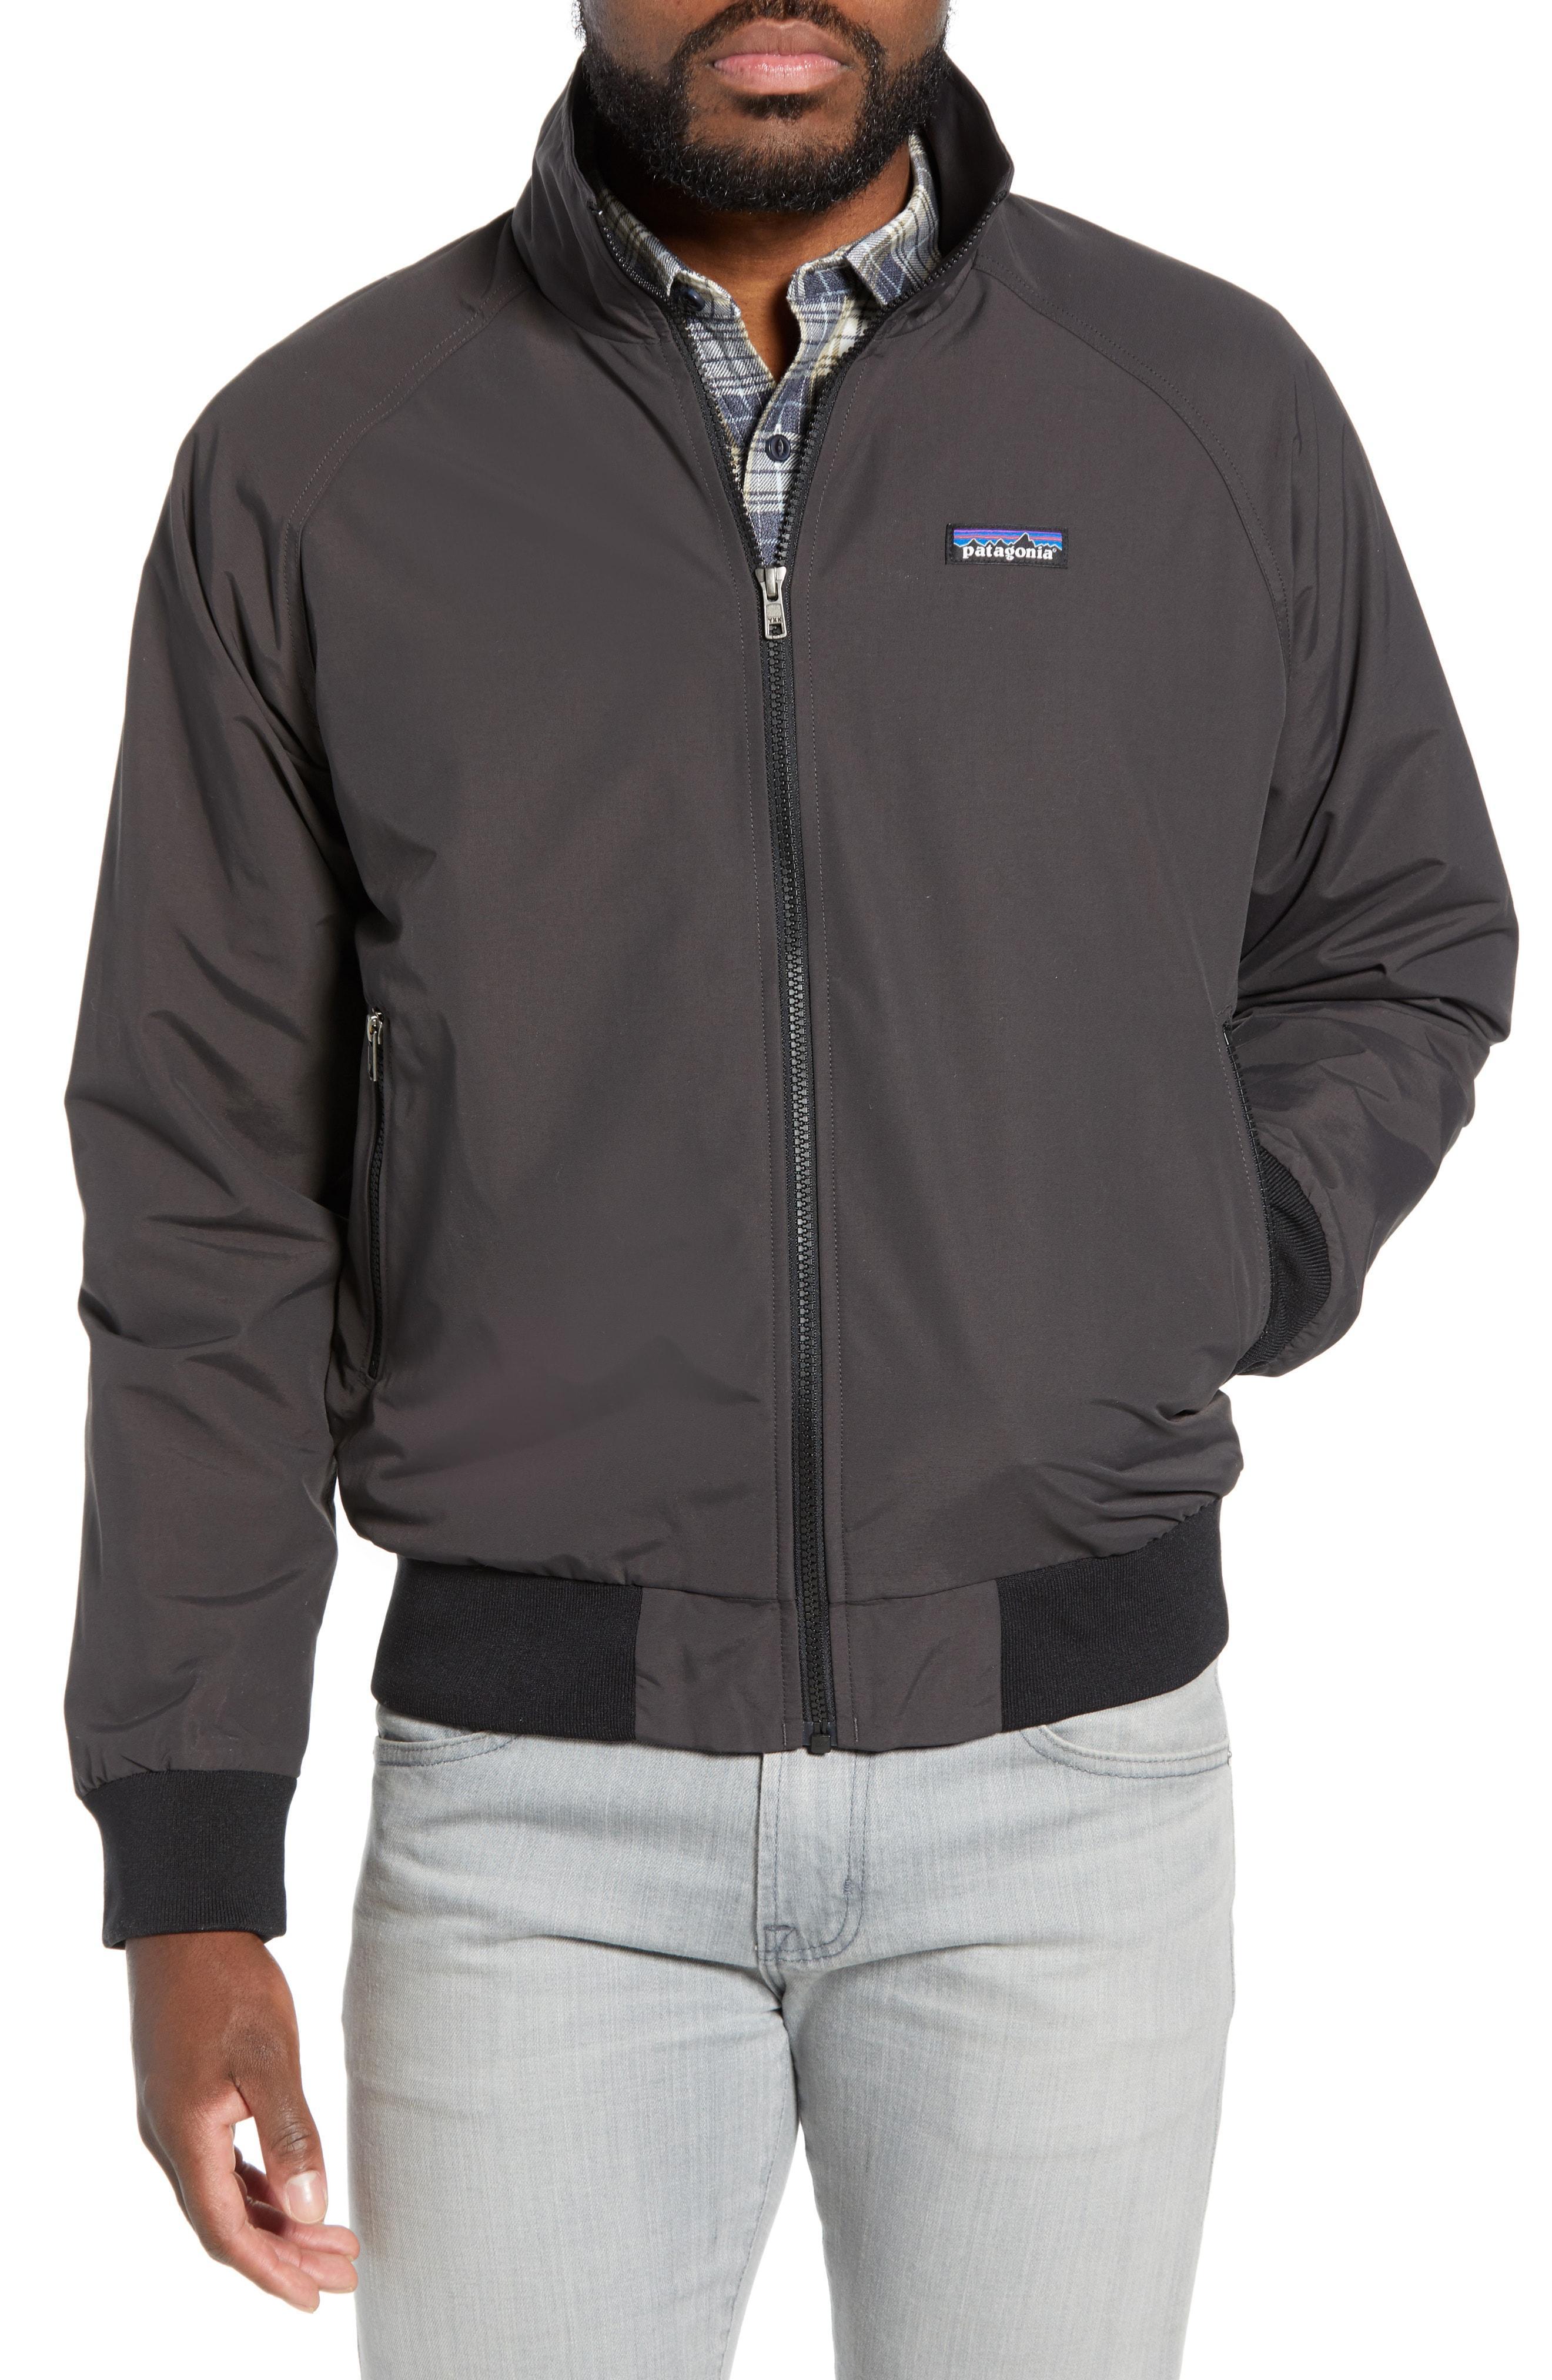 2de30340c5 Patagonia - Black Baggies Wind   Water Resistant Jacket for Men - Lyst.  View fullscreen